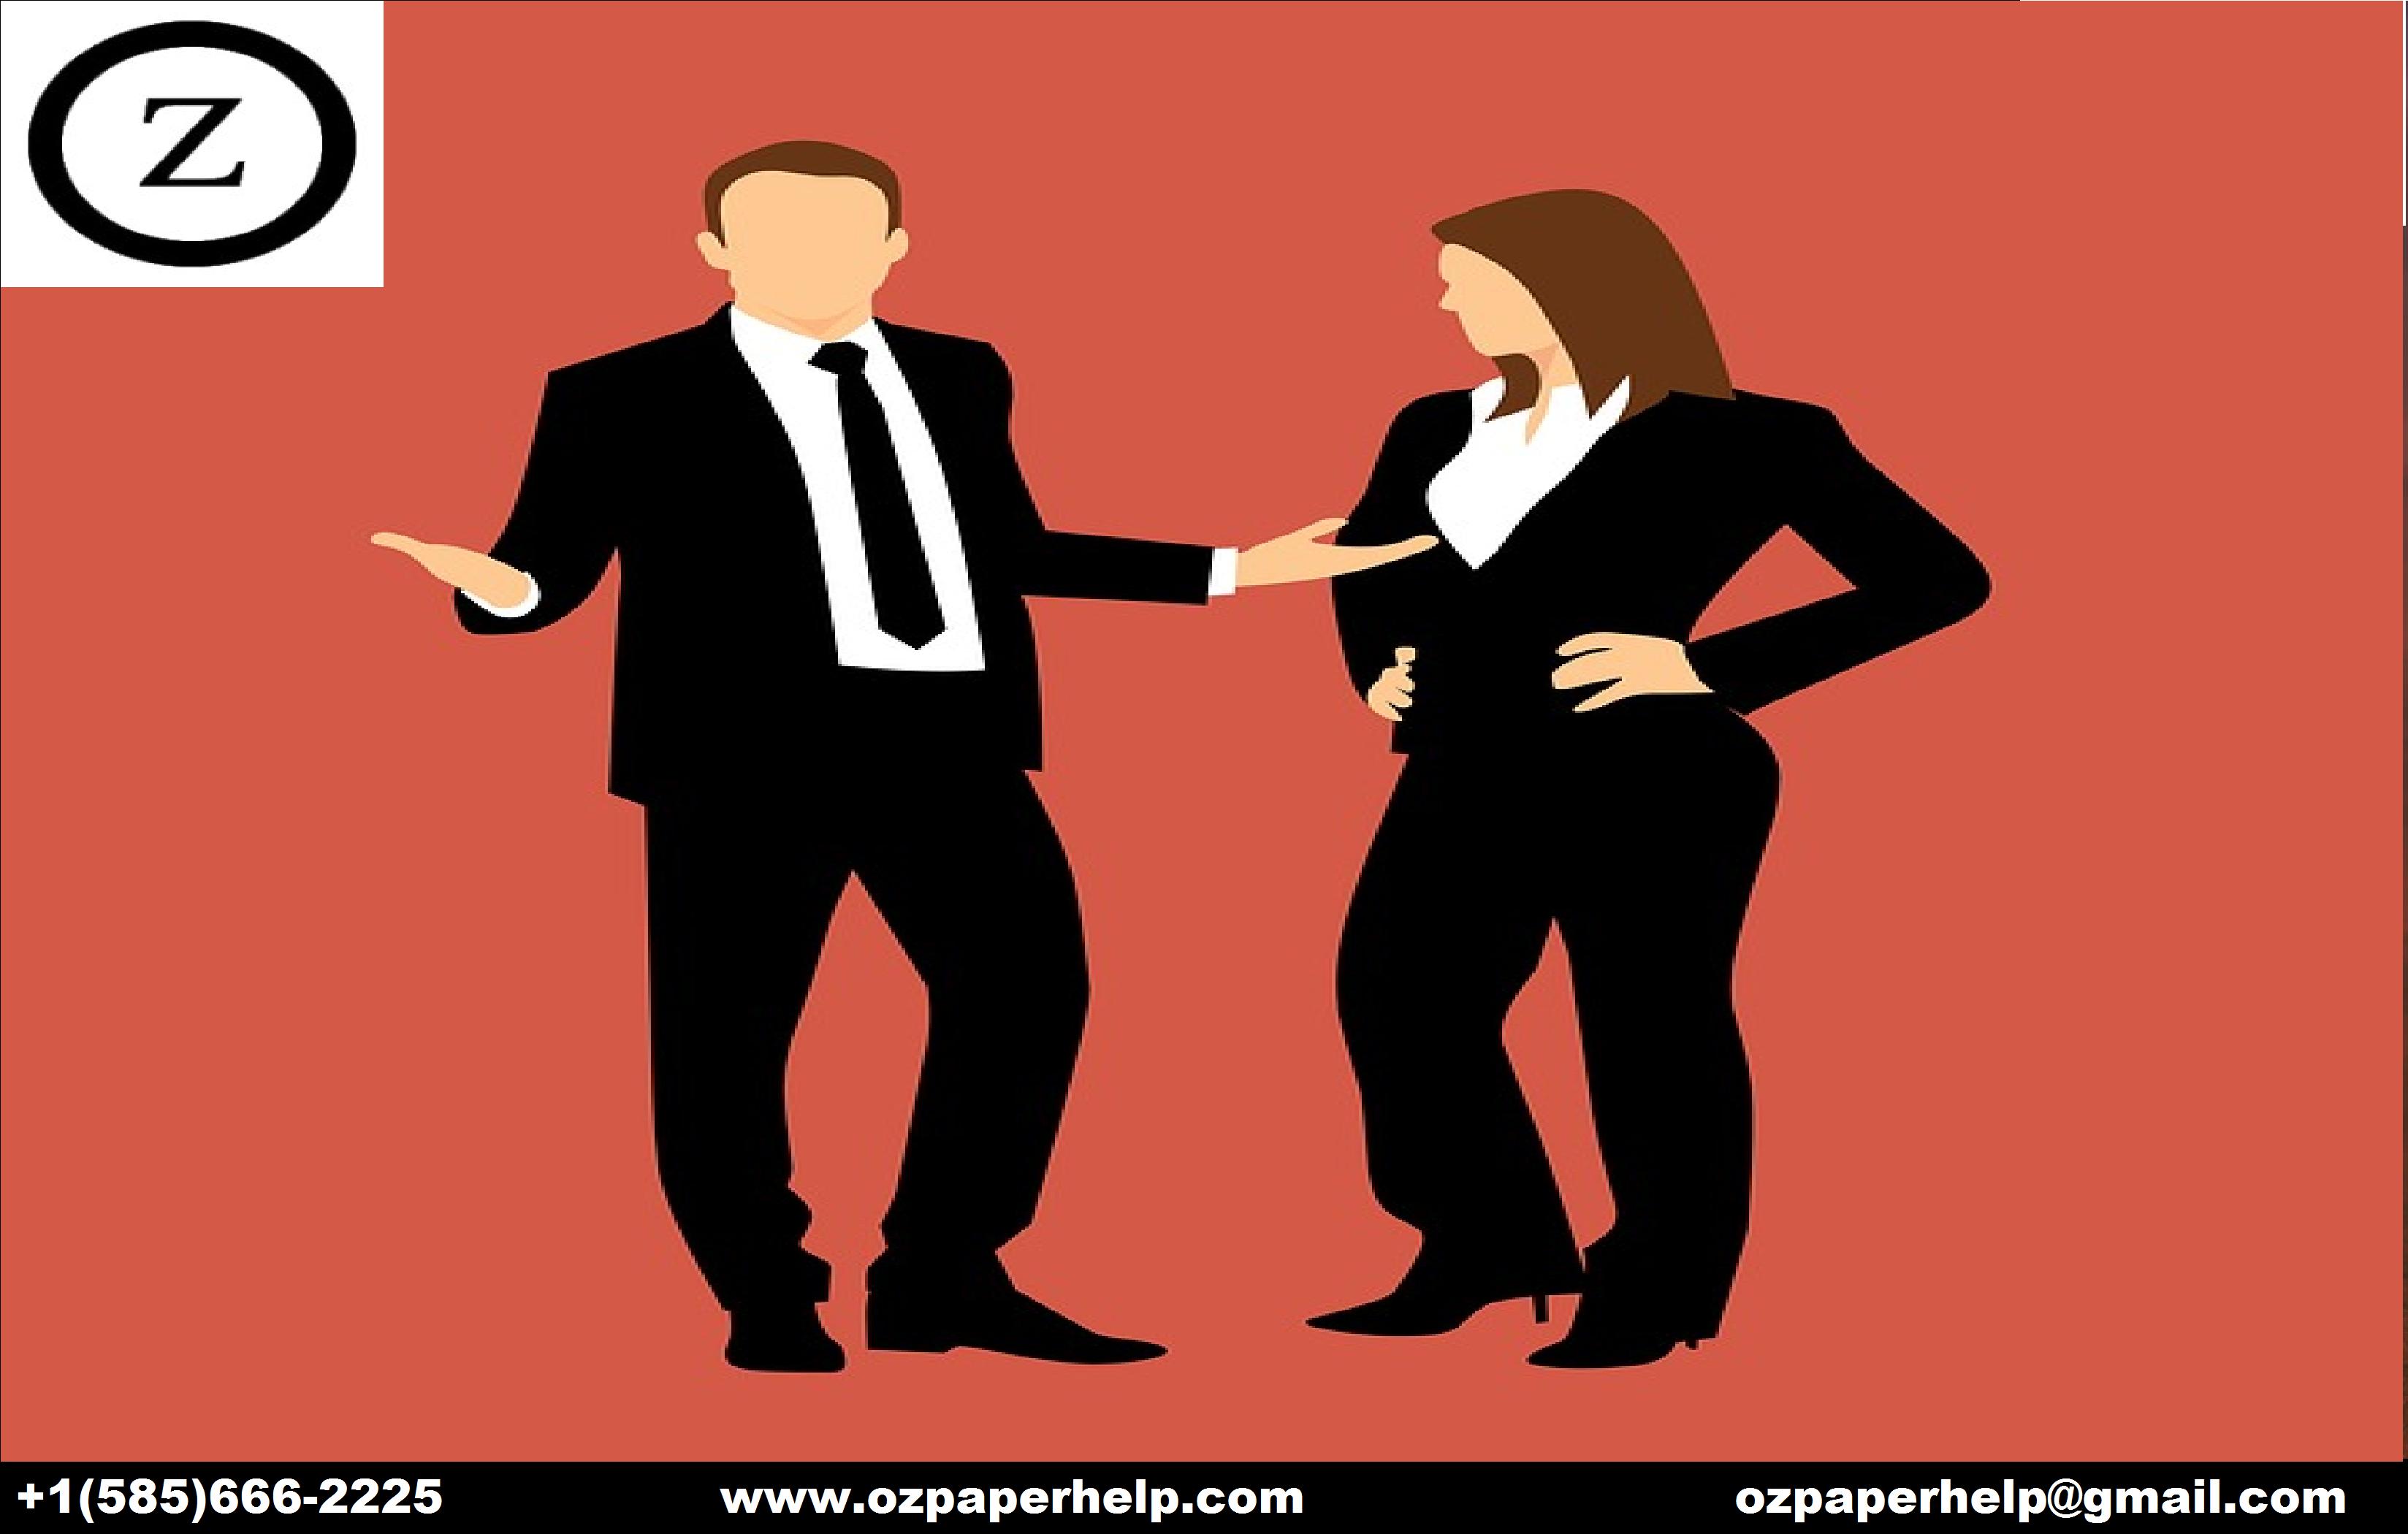 COORDINATE BUSINESS ASSIGNMENT HELP